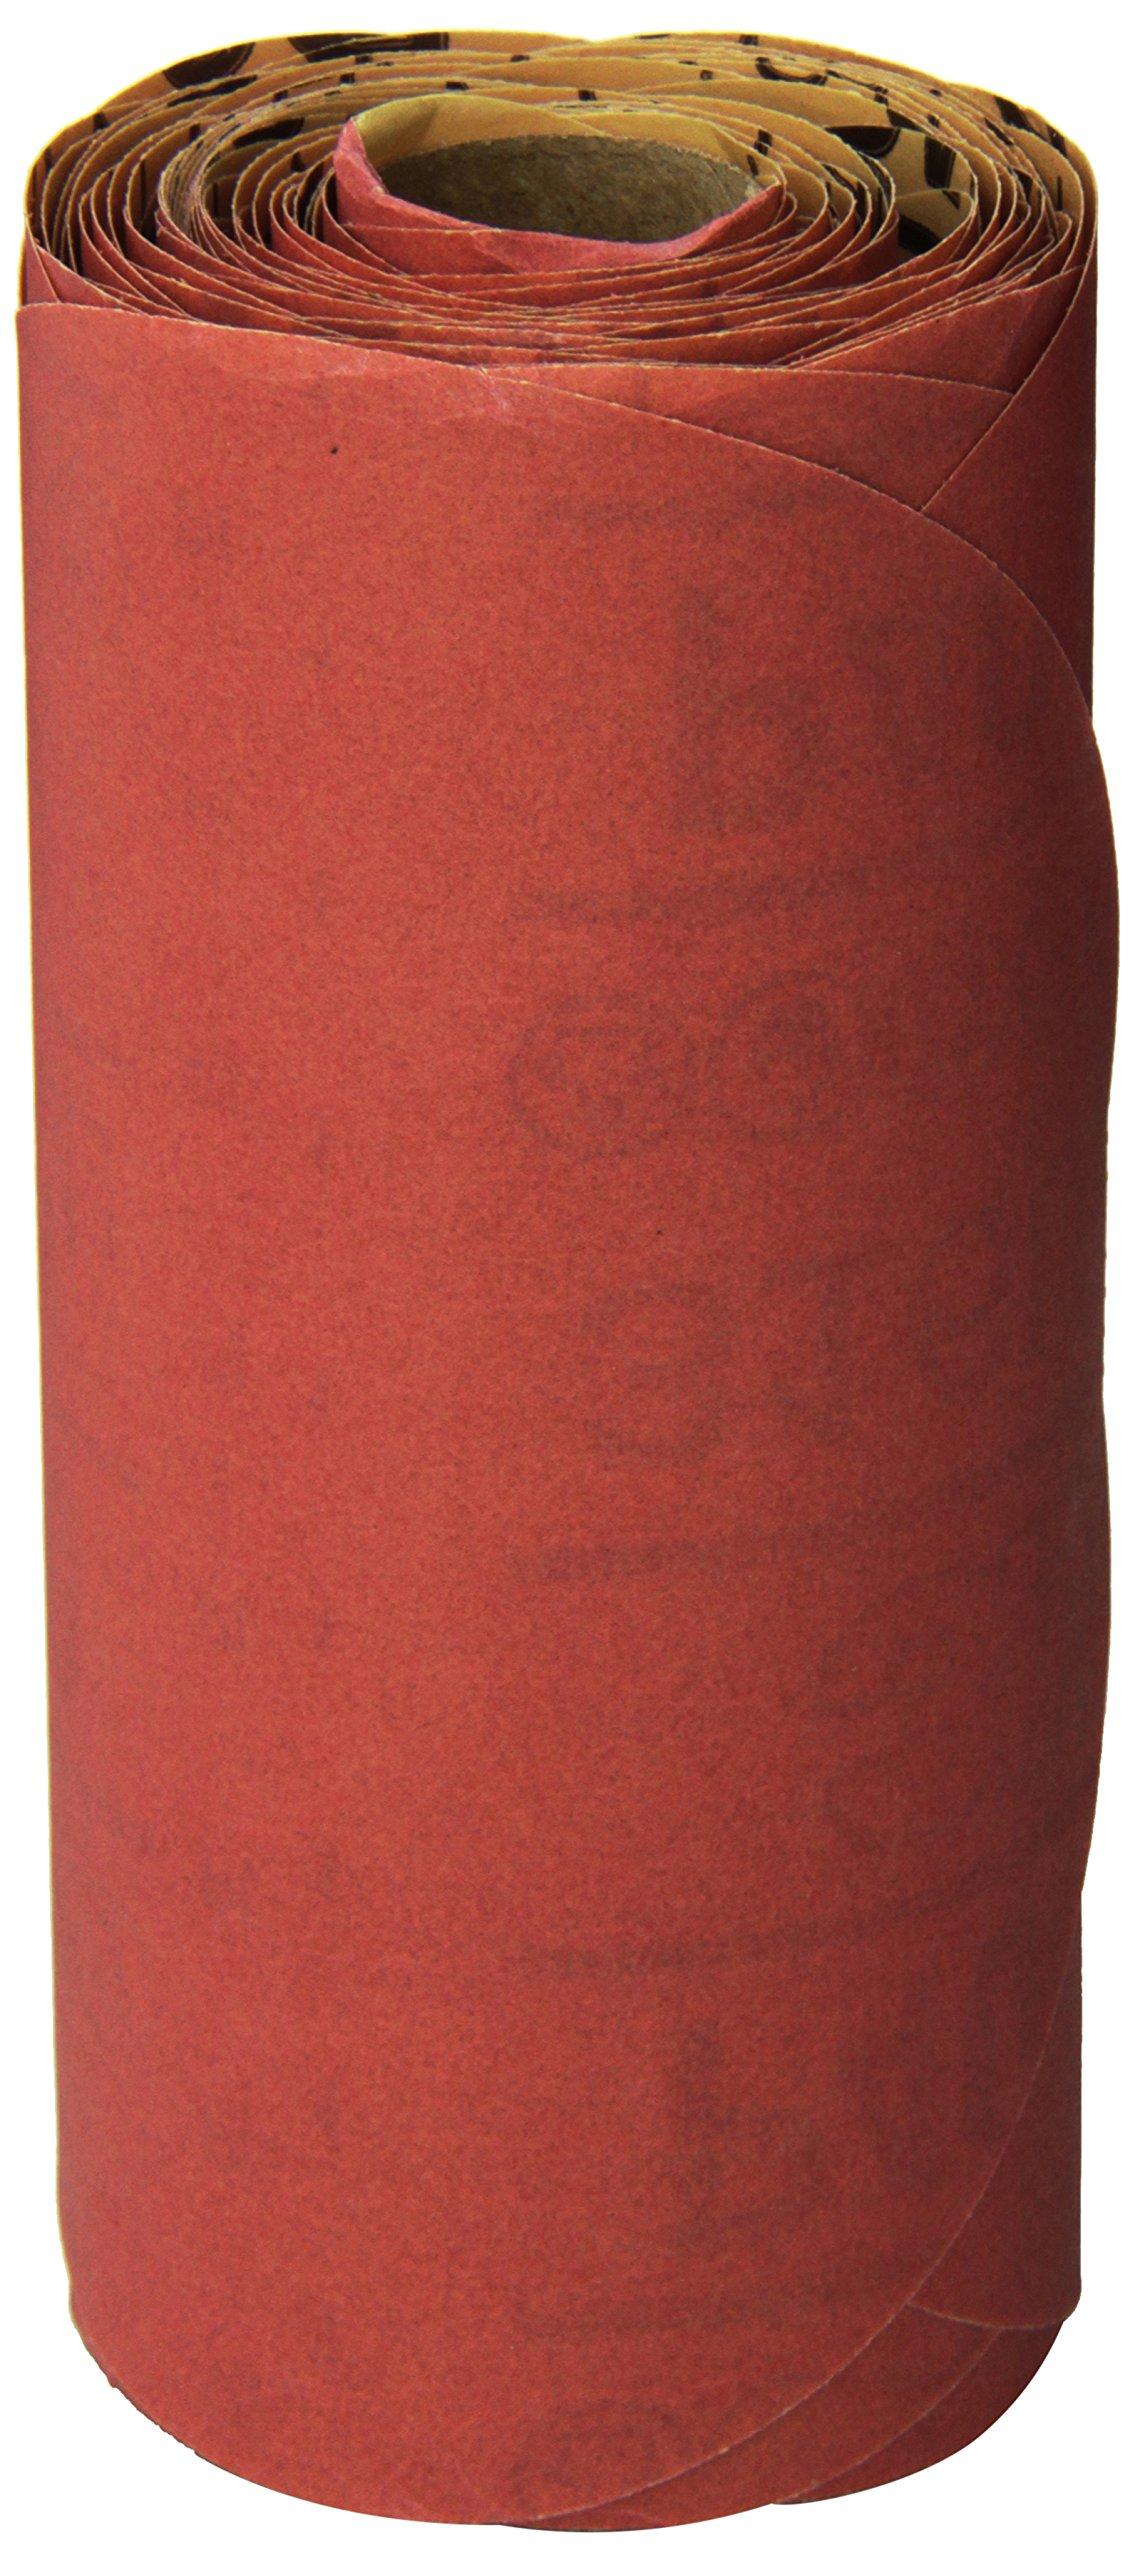 3M 01108 Stikit Red 6'' P400 Grit Abrasive Disc by 3M